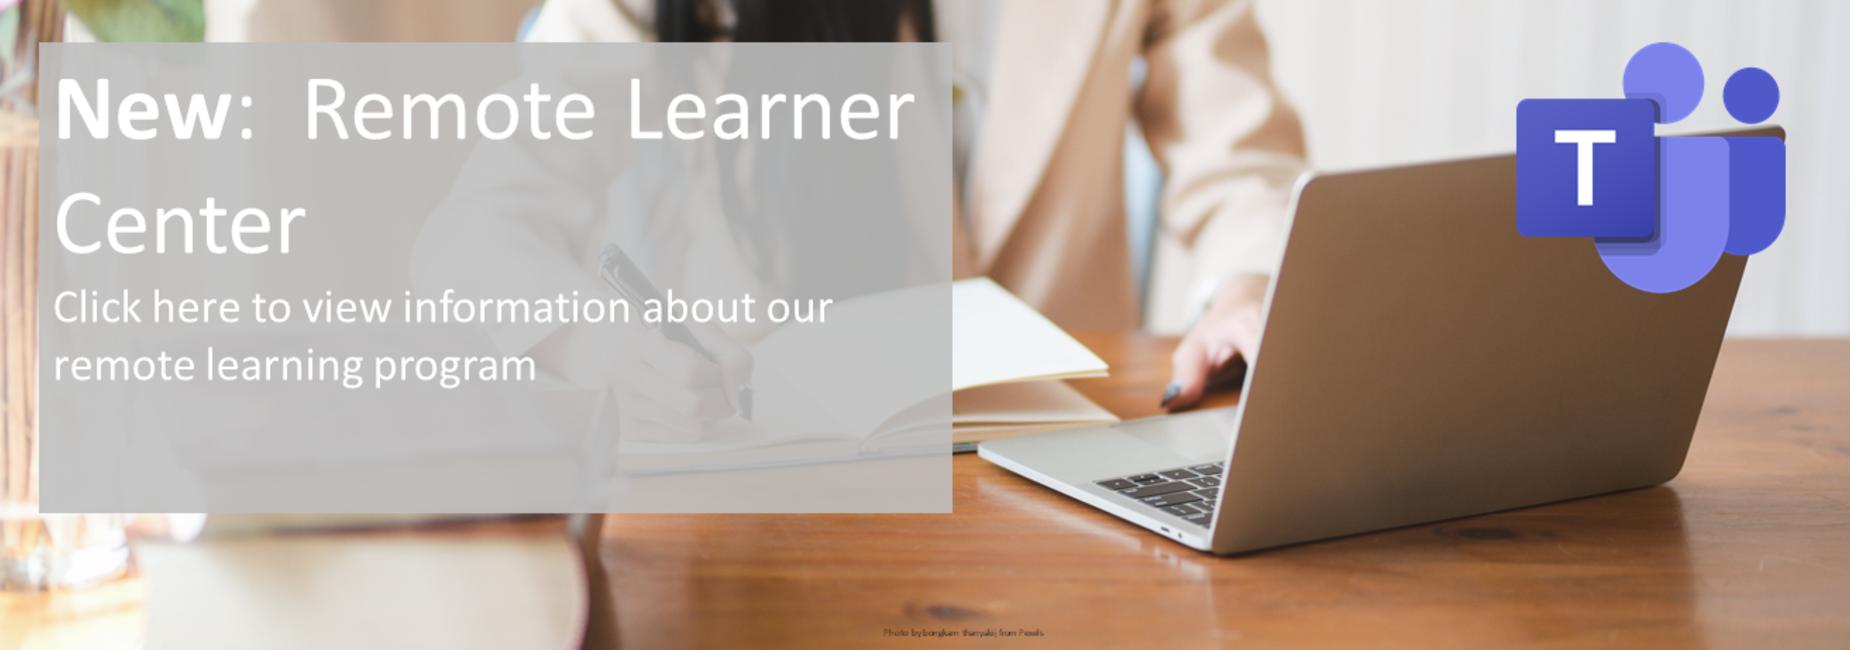 Remote Learner Center